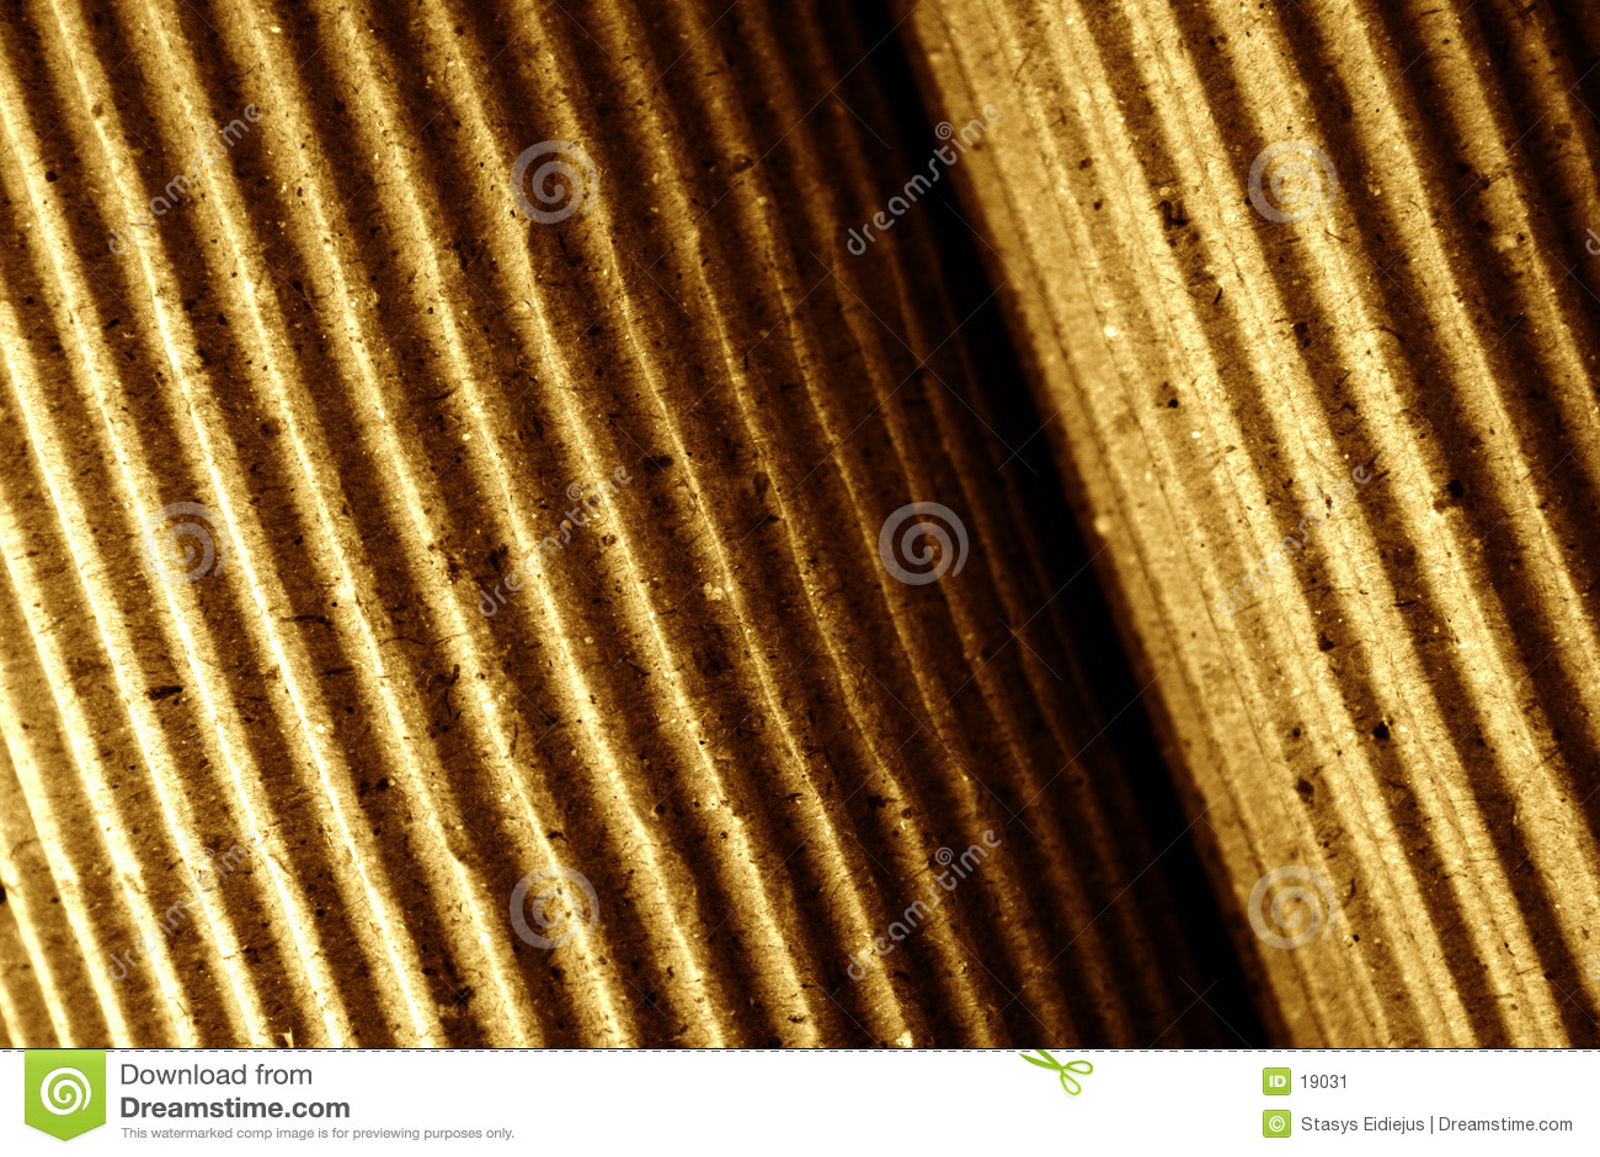 Papel ondulado, rolled-up, close-up, tonificado